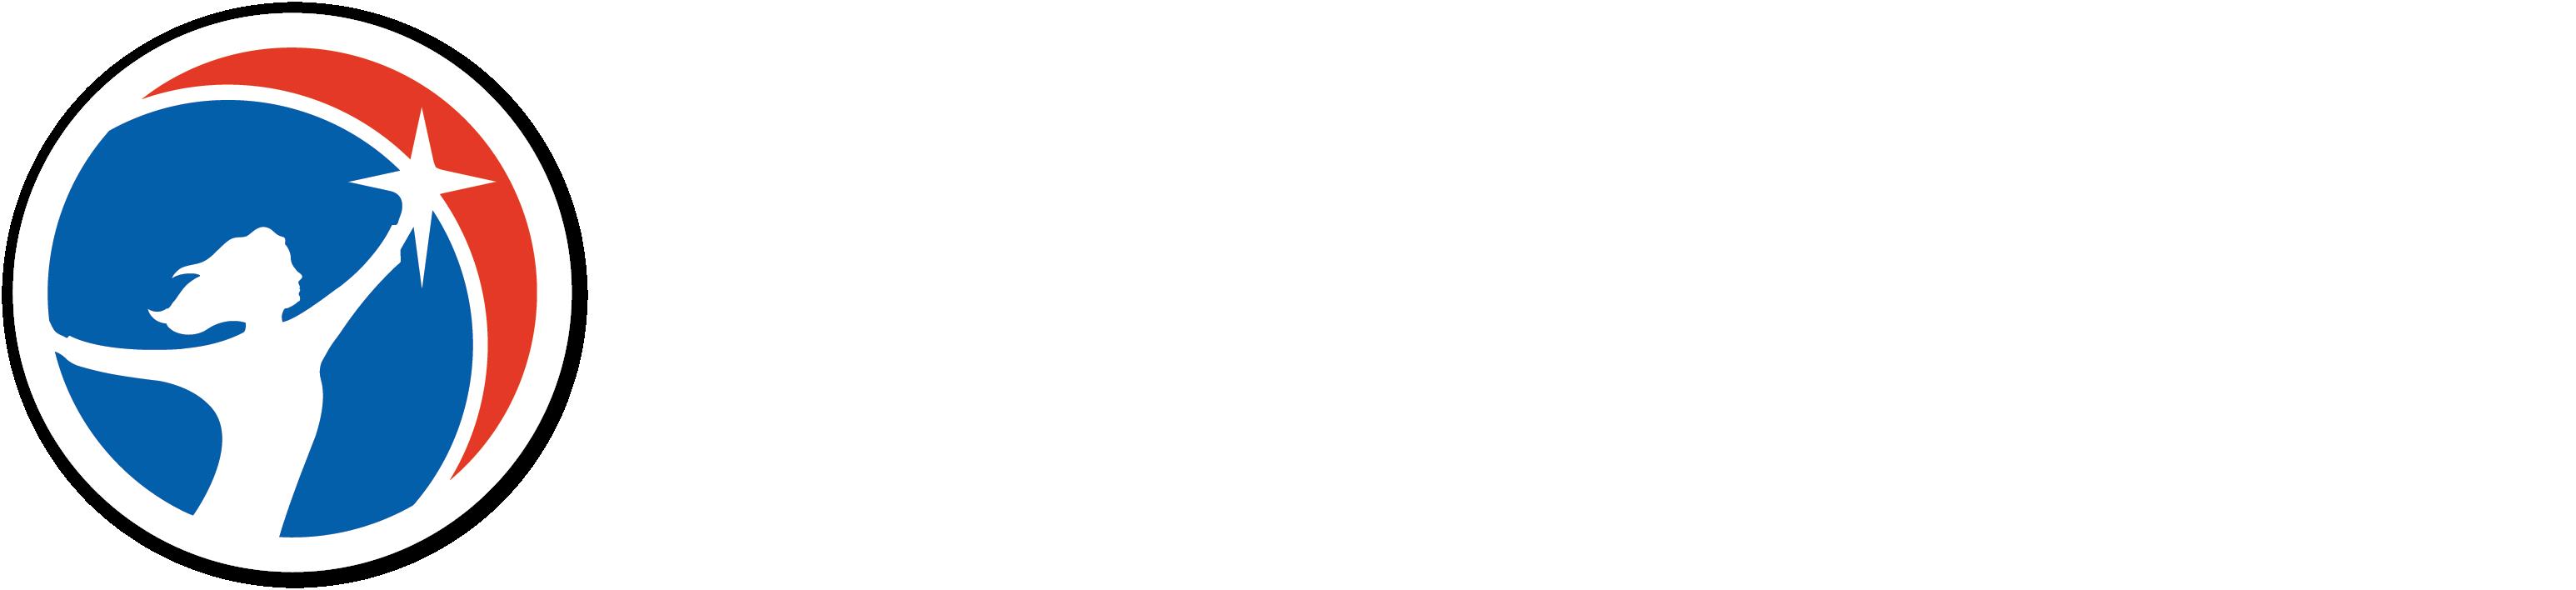 American Heritage Girls 25th Anniversary Logo Vertical Full Color